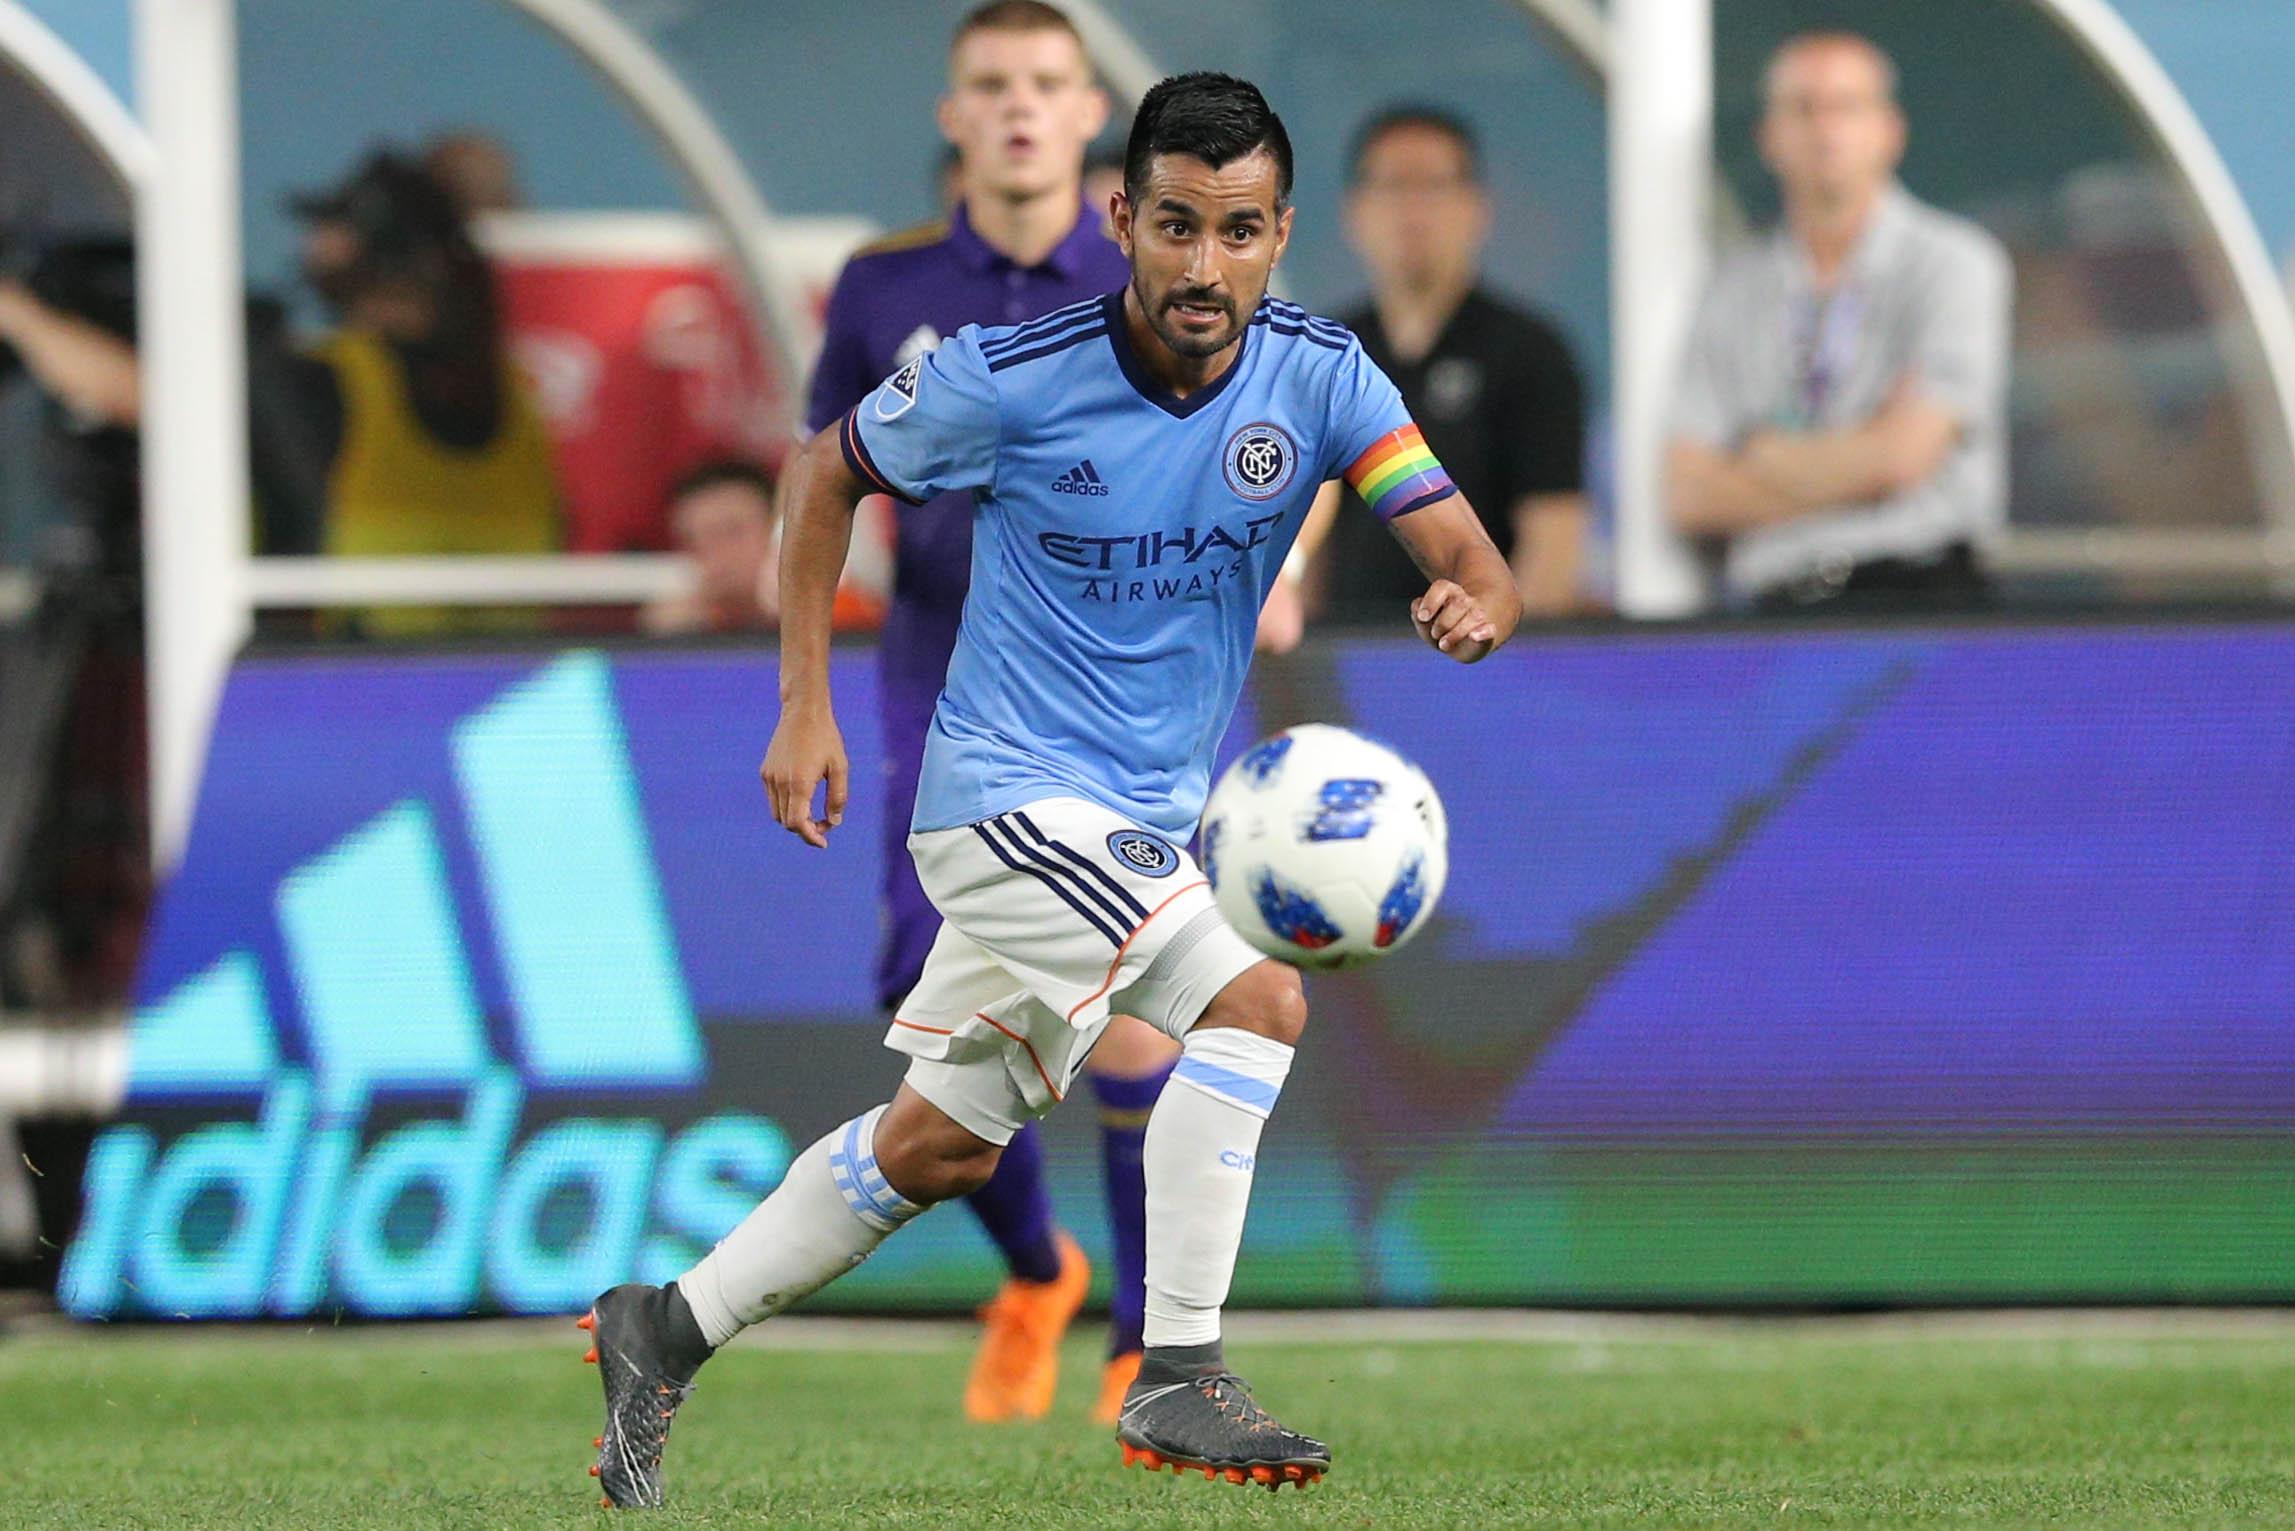 MLS: Orlando City SC at New York City FC